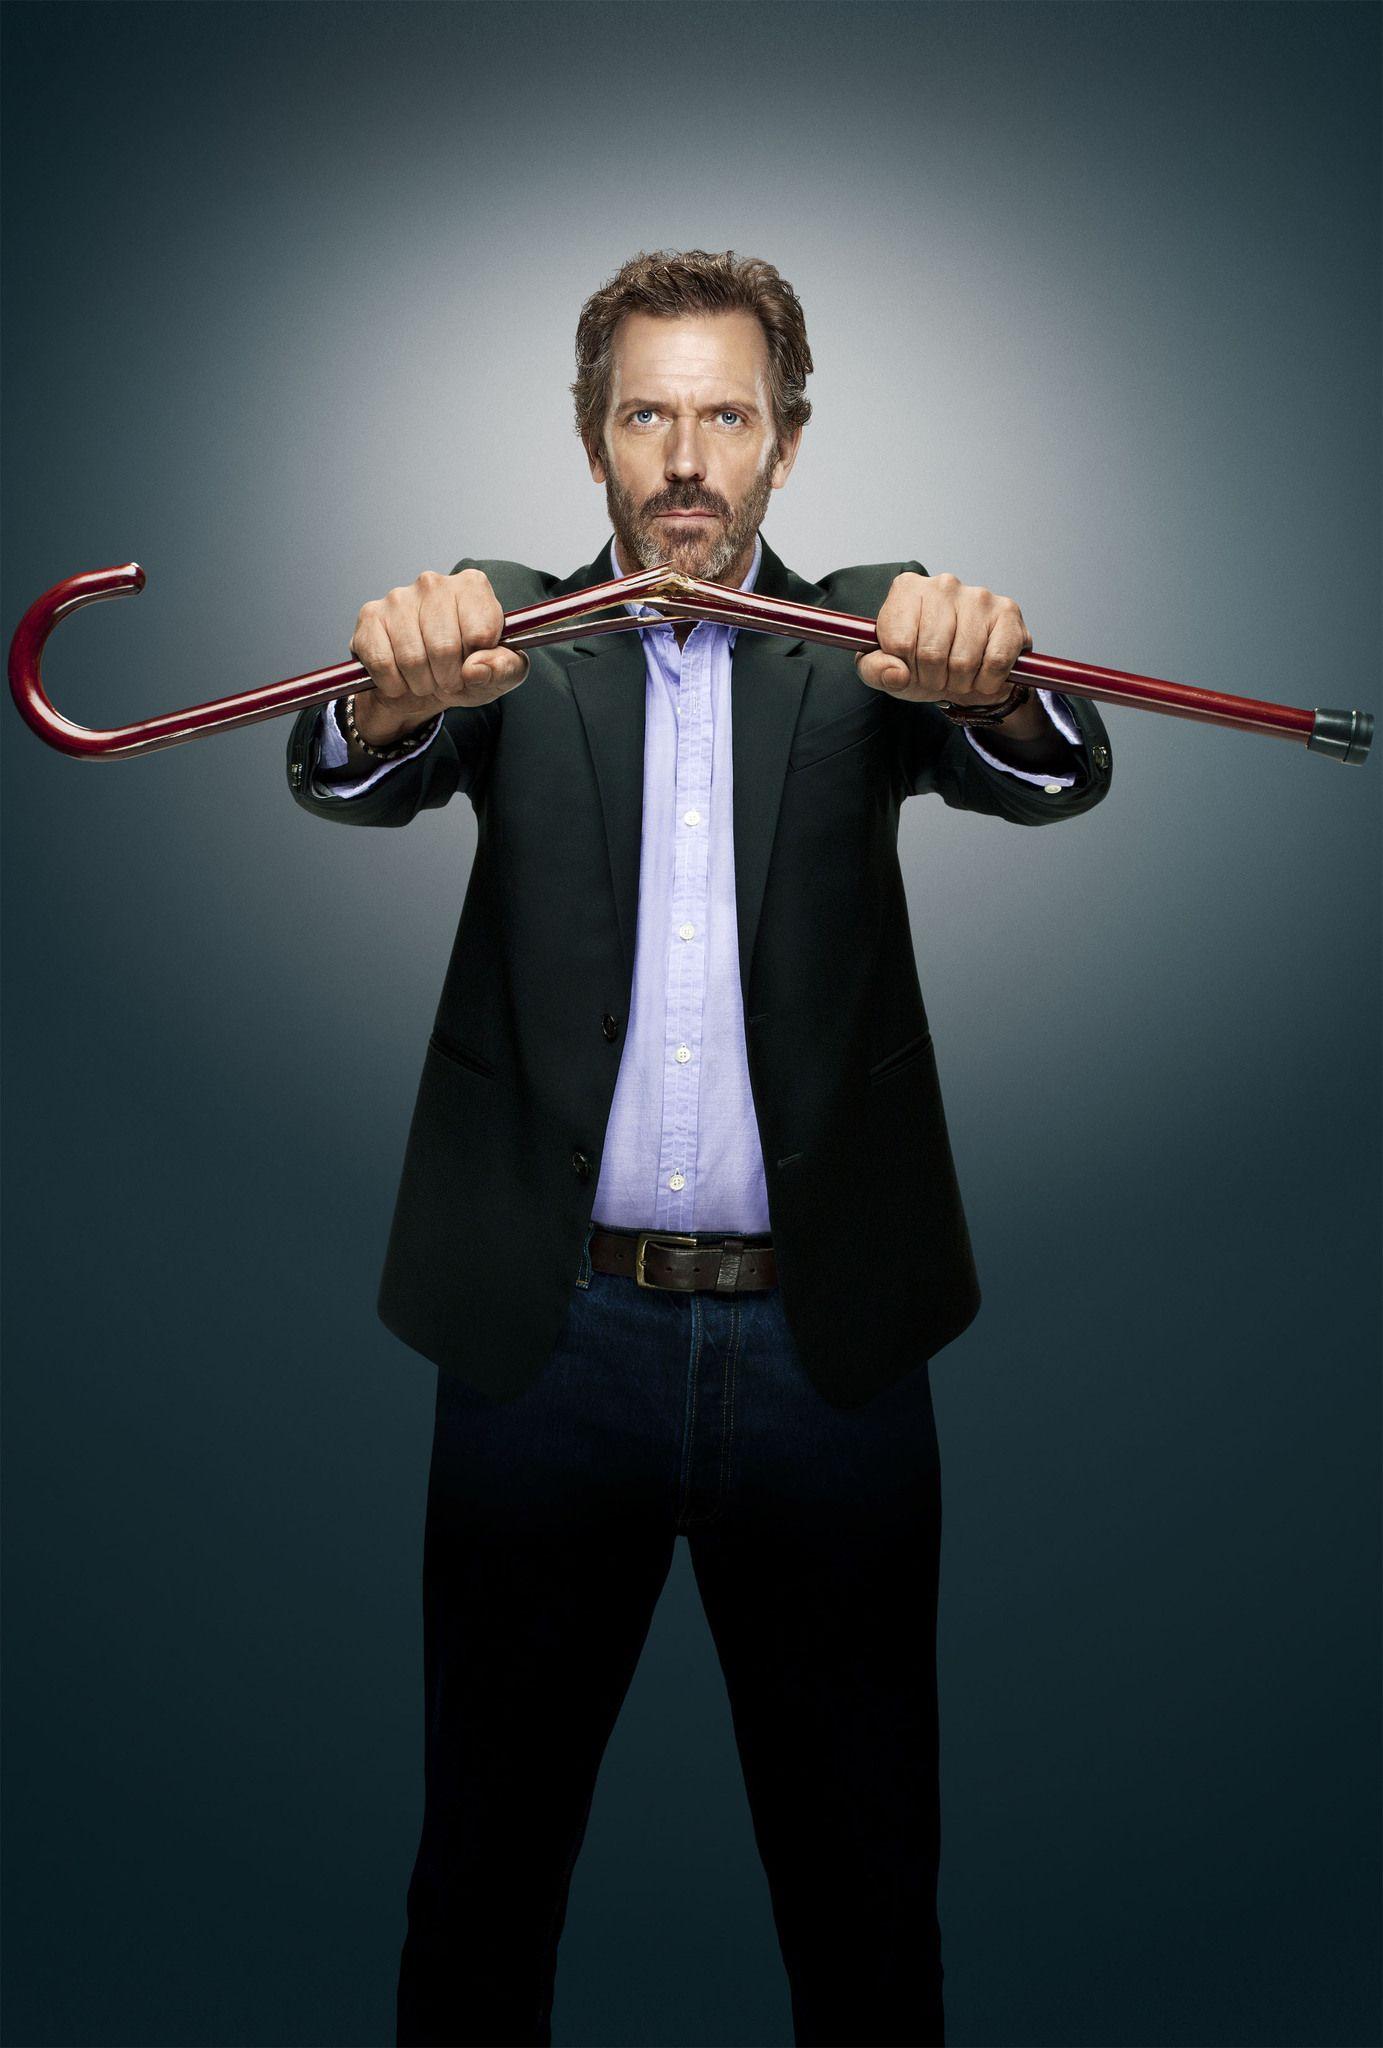 Dr House Imagenes de tv, Doctor house, Serie doctor